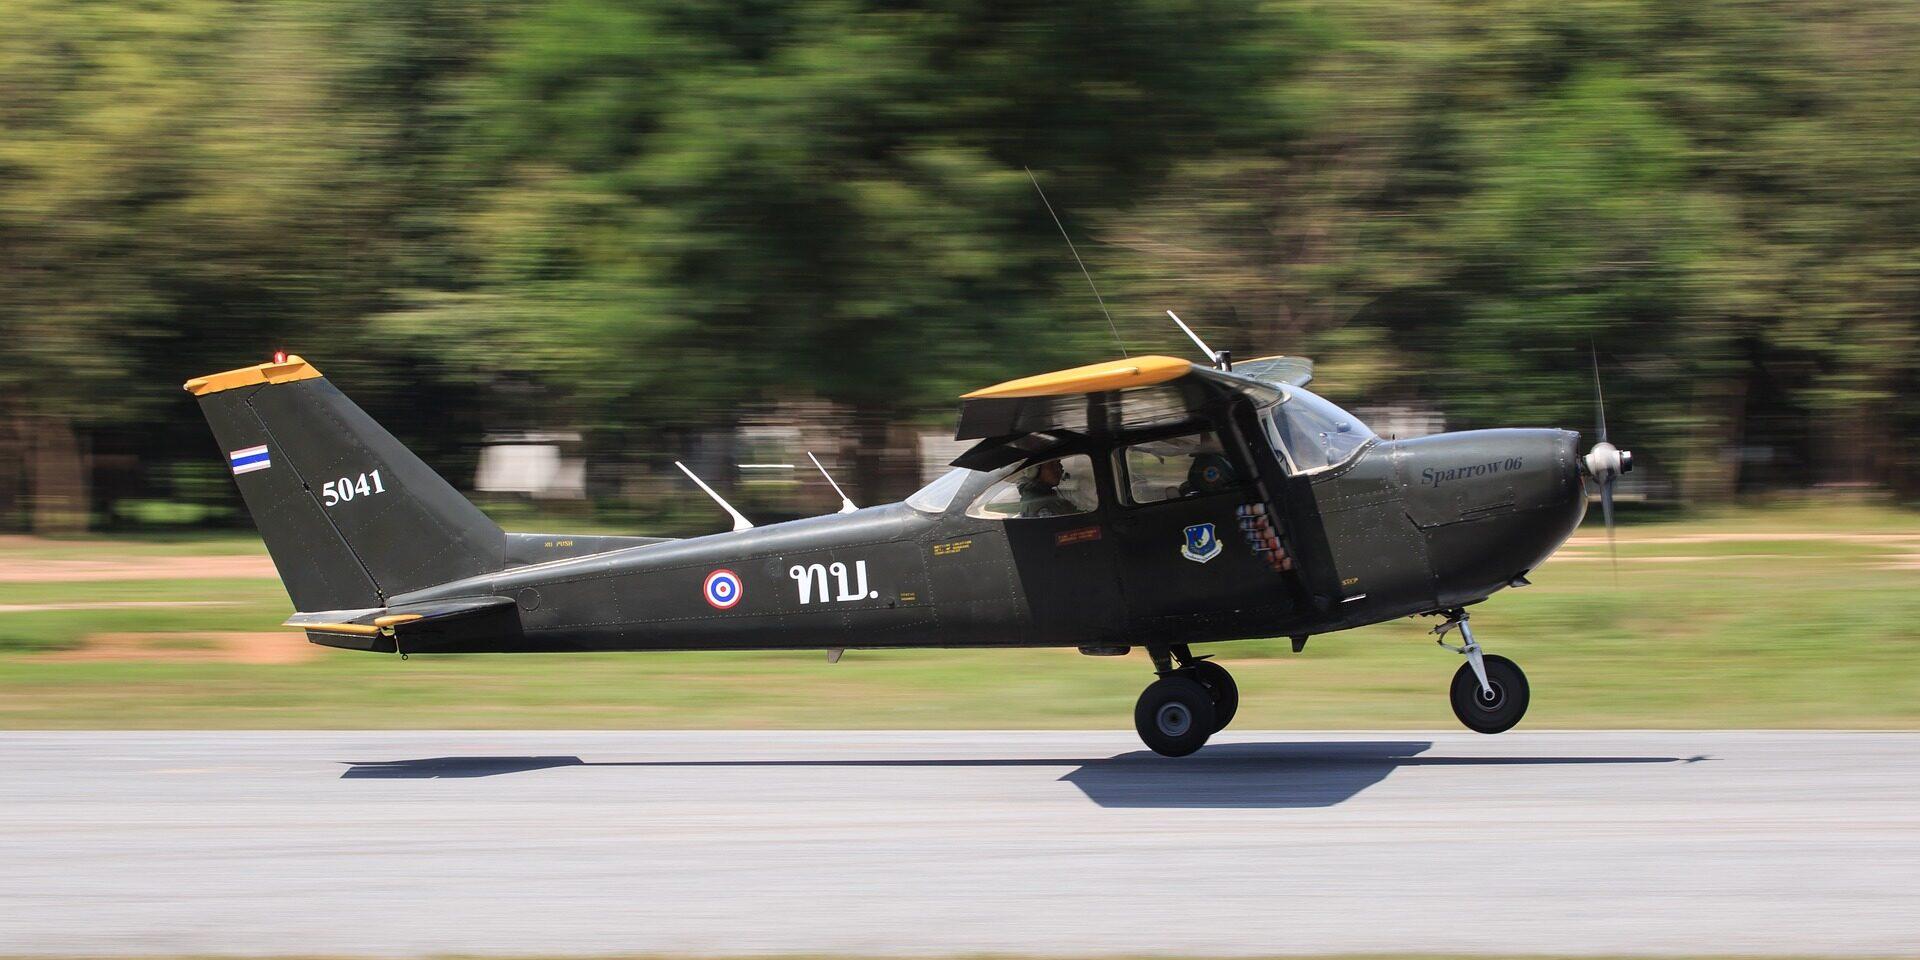 aeroplane-1839172_1920